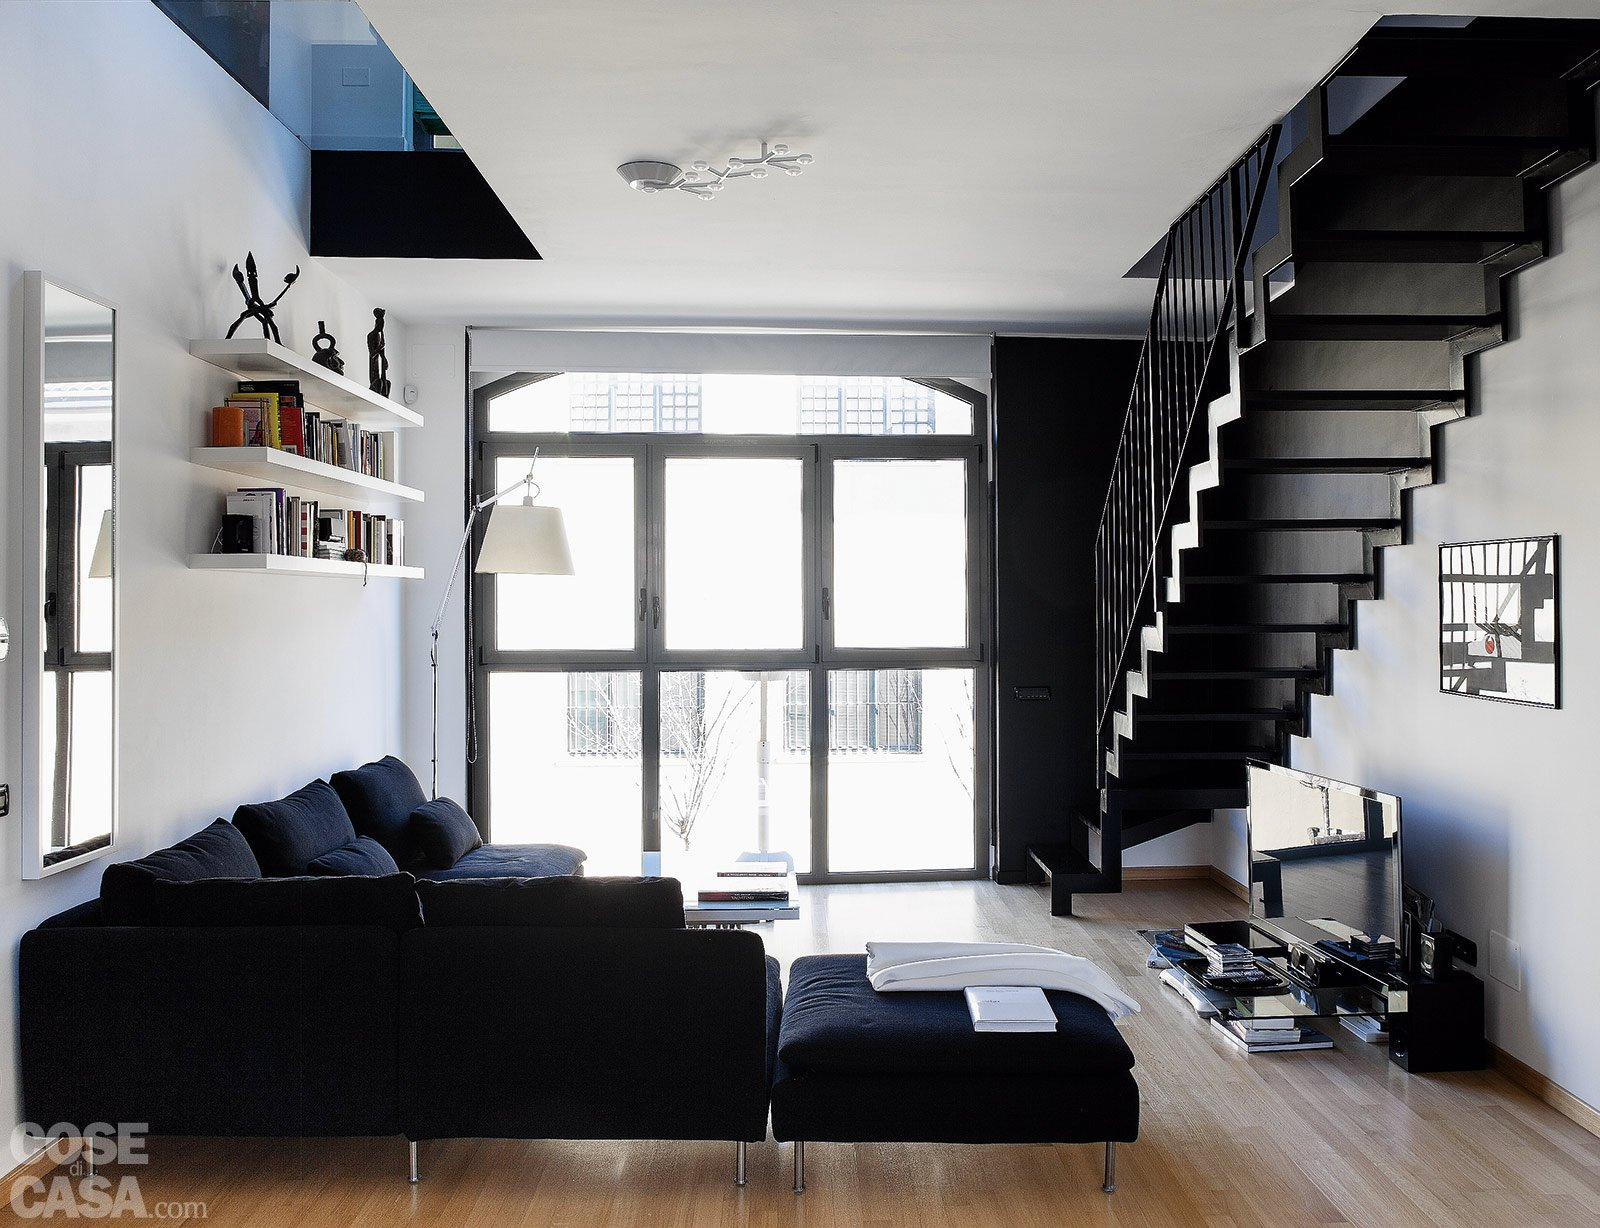 60 50 mq una casa con elementi a scomparsa cose di casa - Casa 50 mq ikea ...